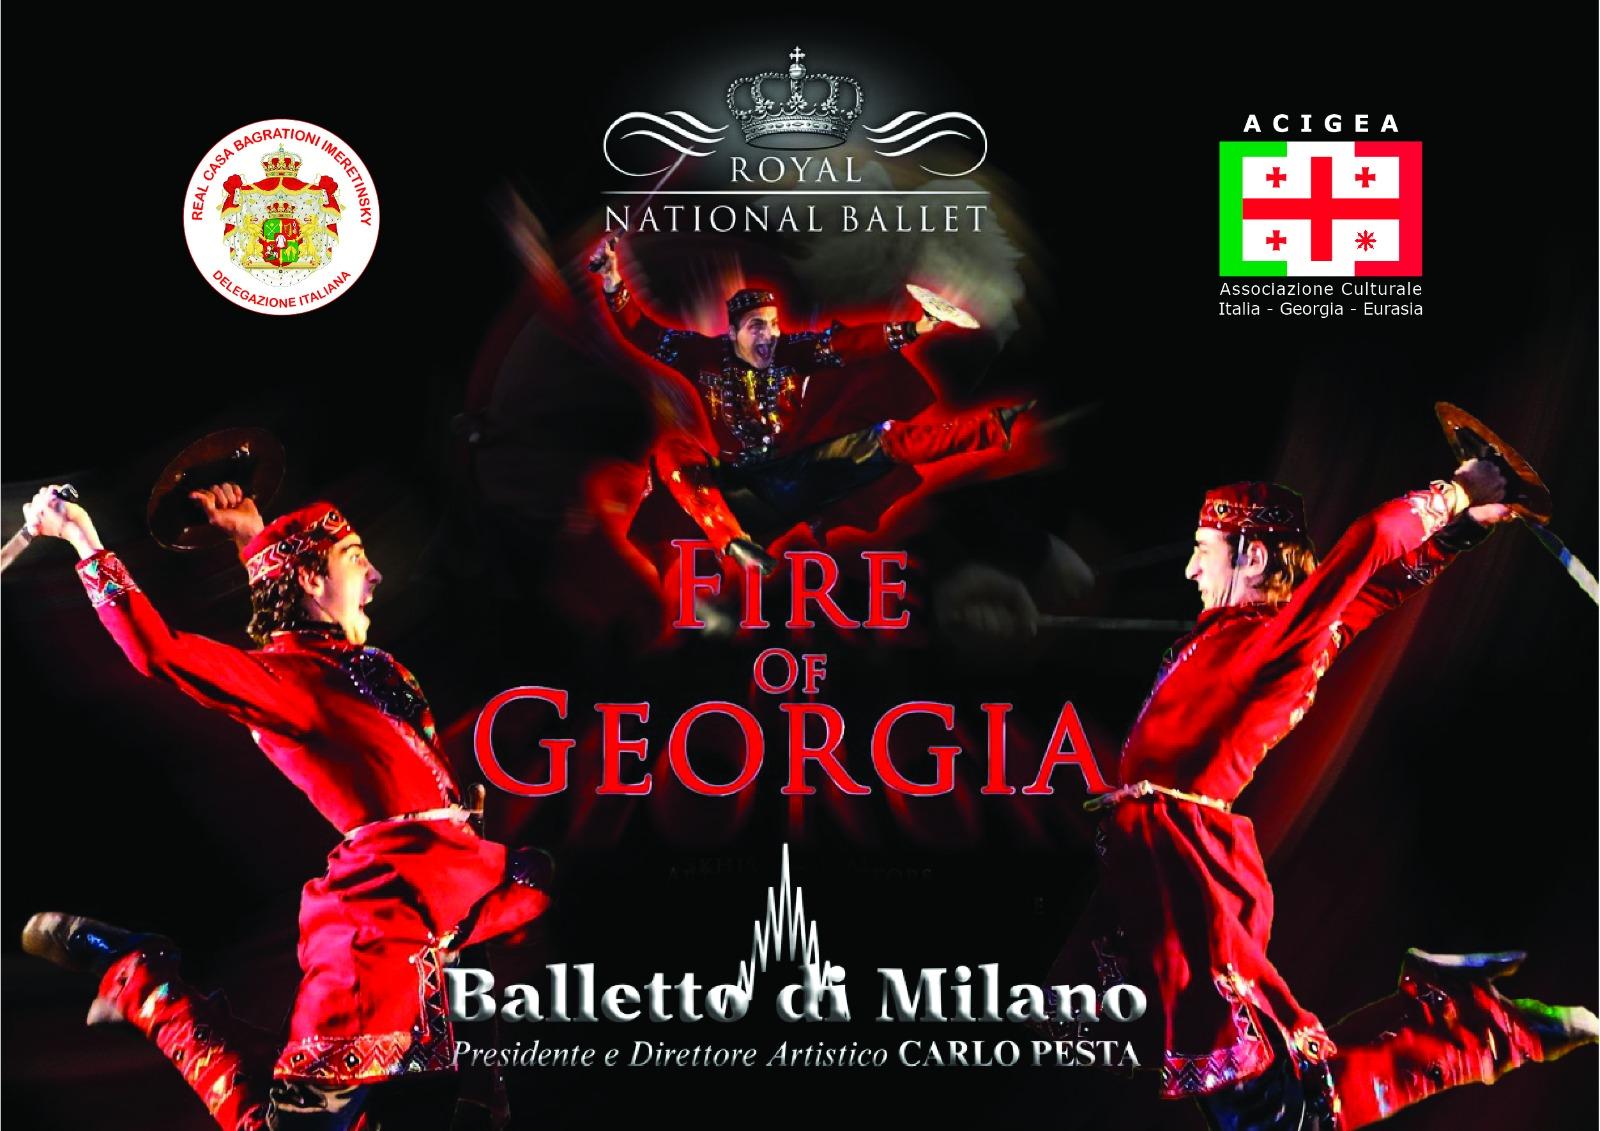 Royal National Ballet of Georgia